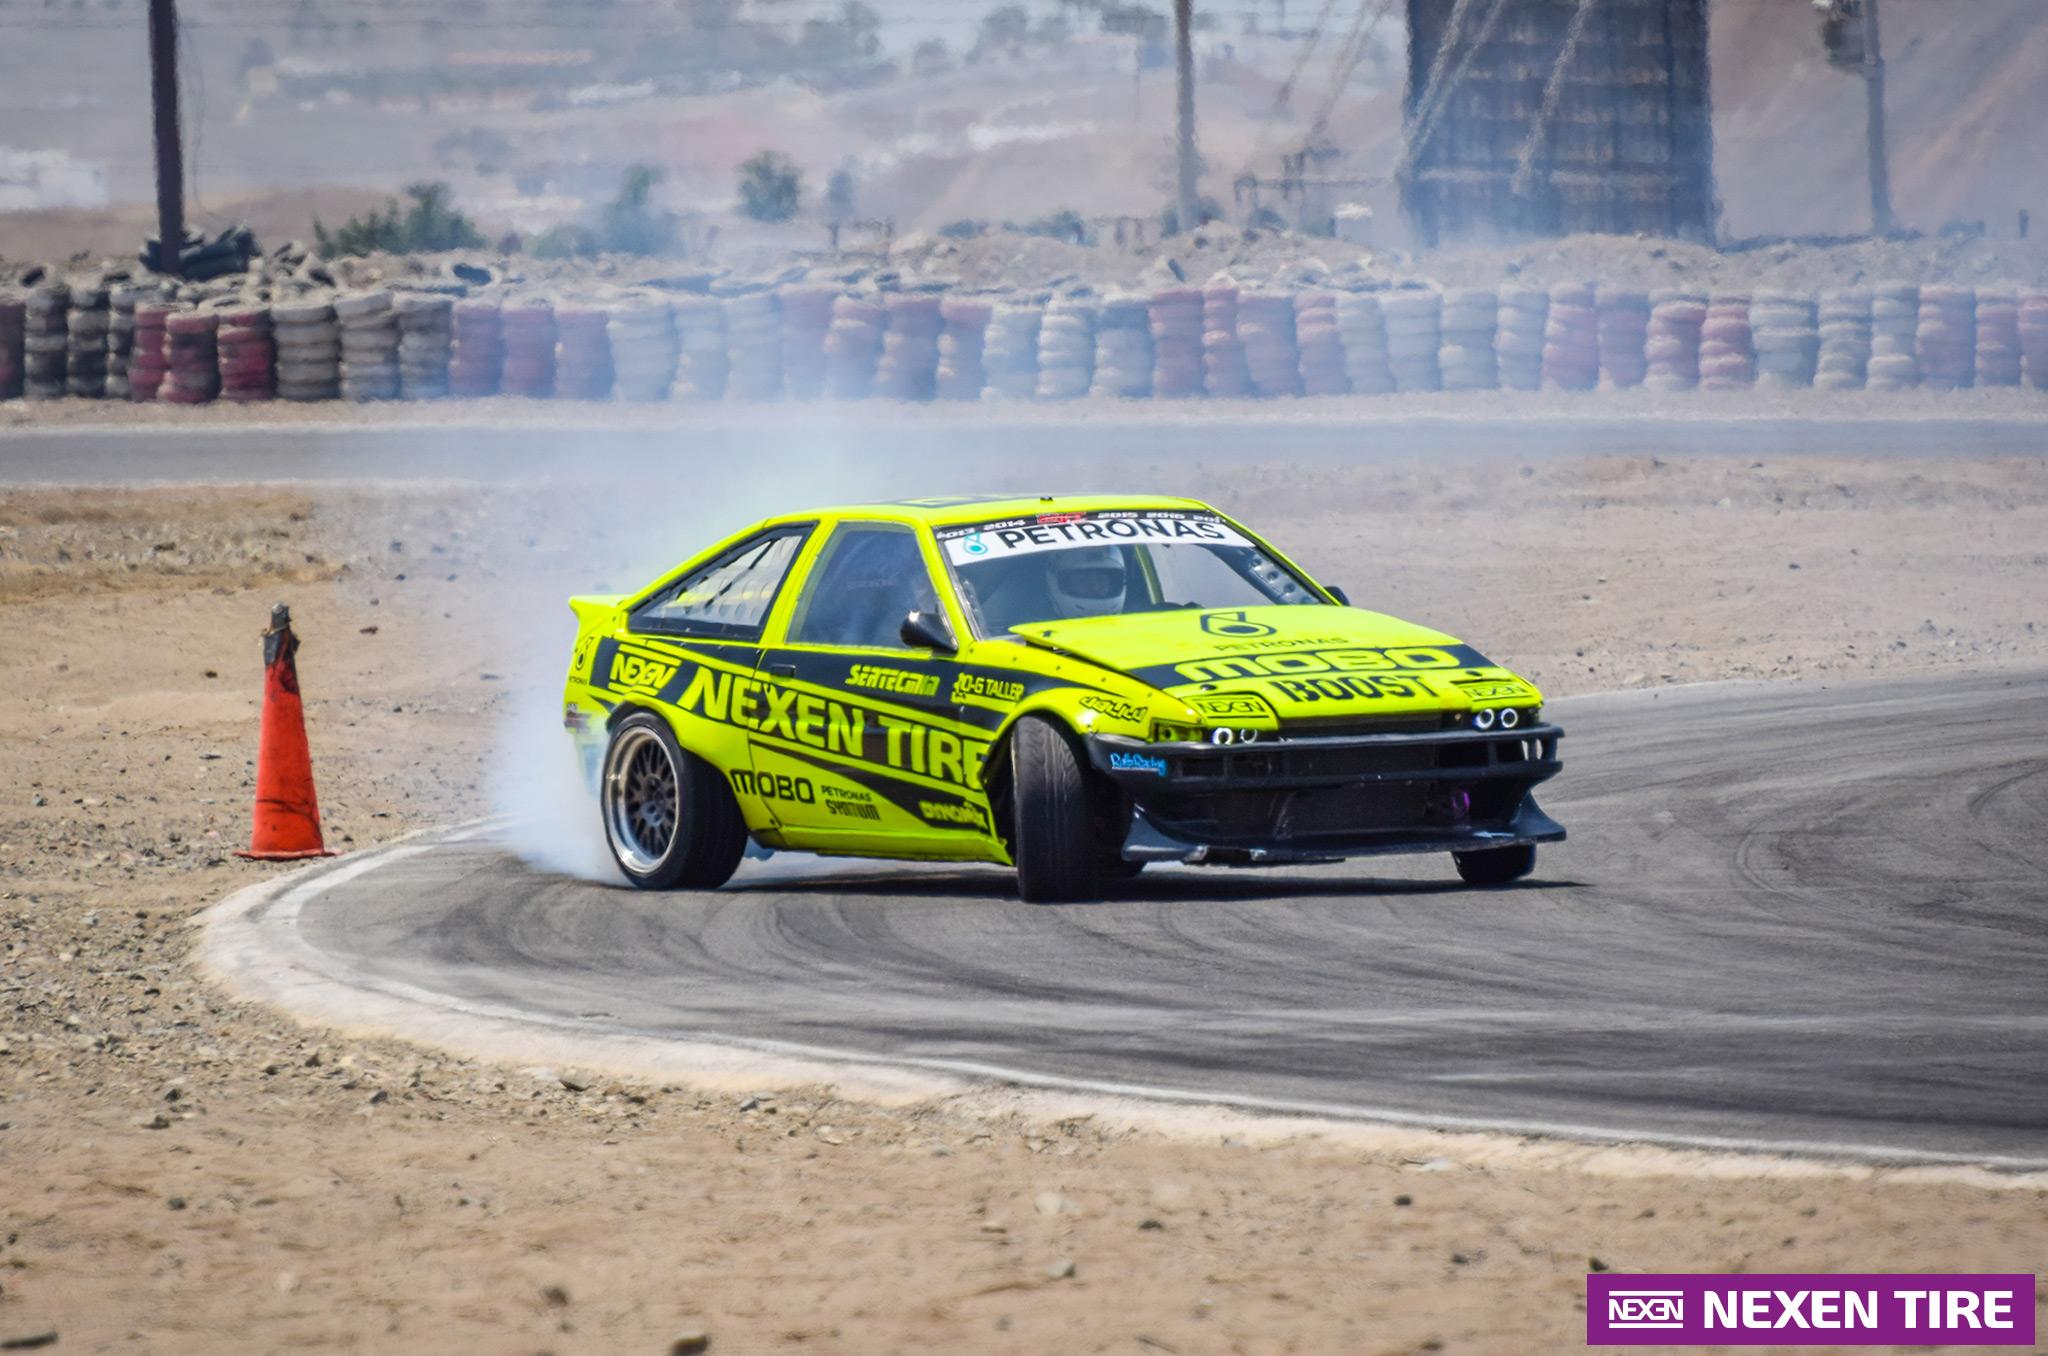 Pro-Drift_-Nexen_La-Chutana